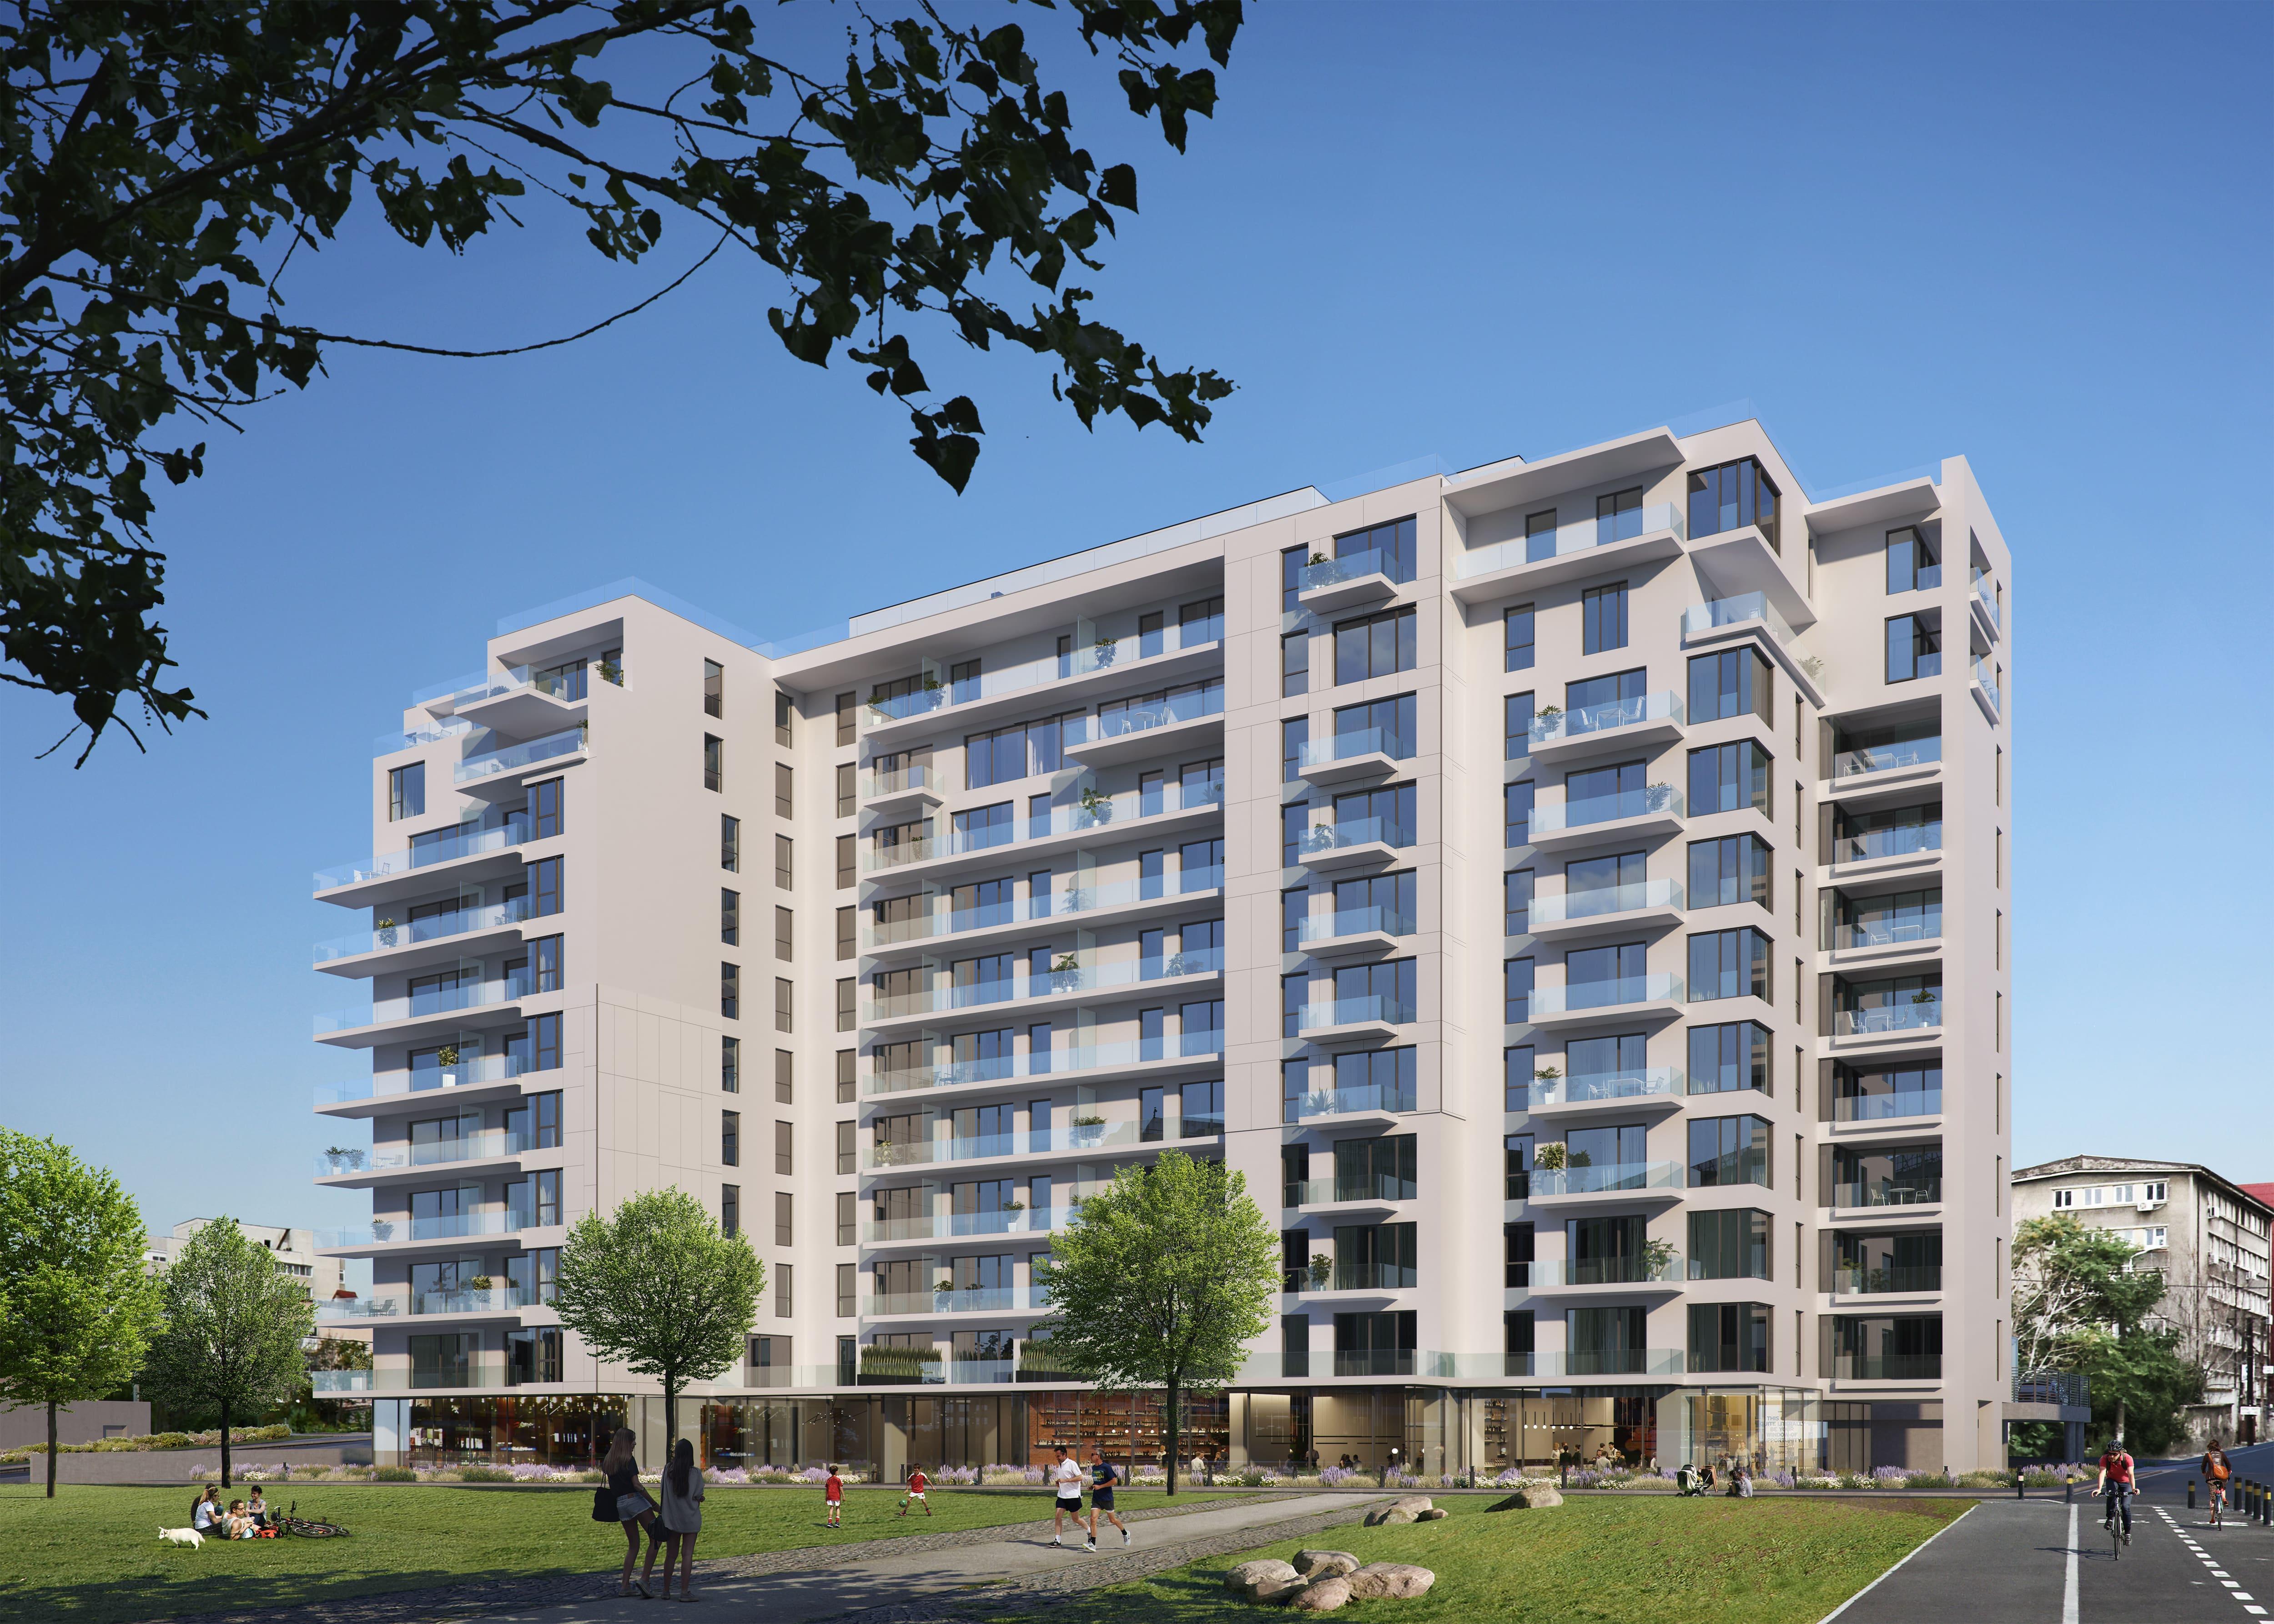 https://ahe-ro.s3.amazonaws.com/10801/penthouse-si-apartamente-unirii-%287%29.jpg